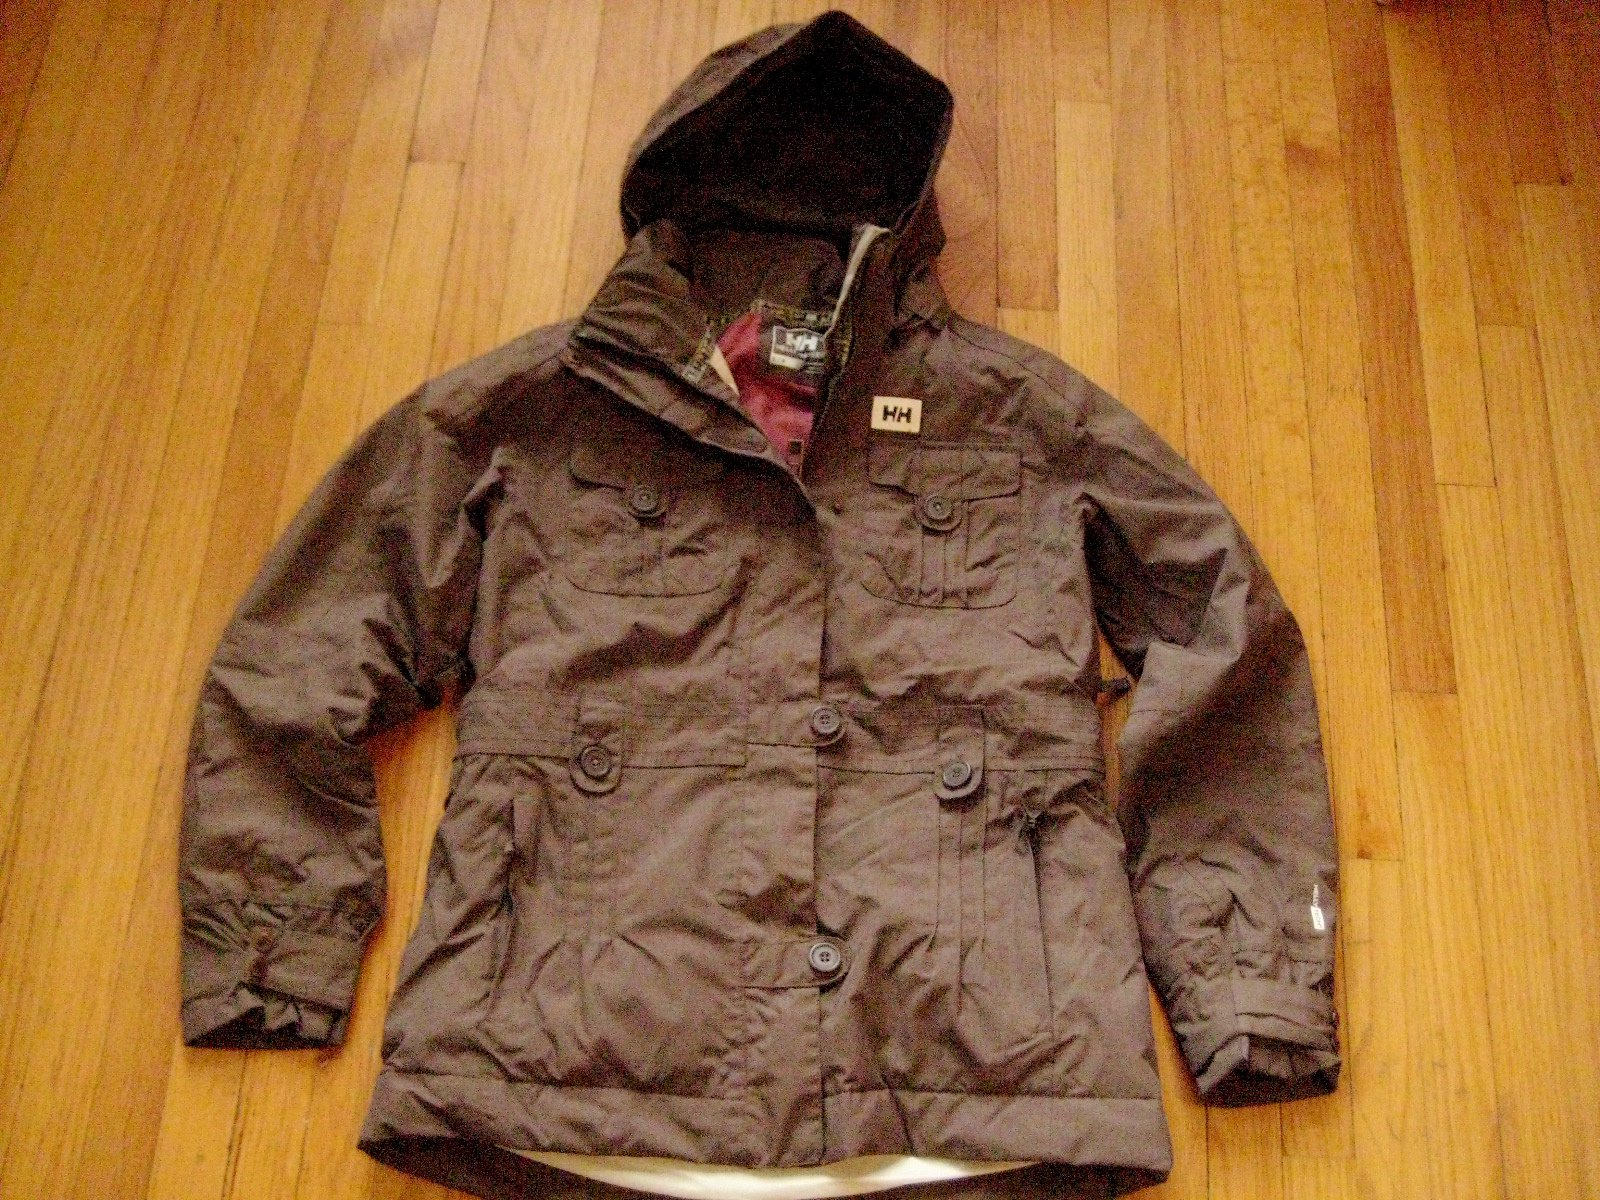 2008 Helly Hansen Women's jacket for $190